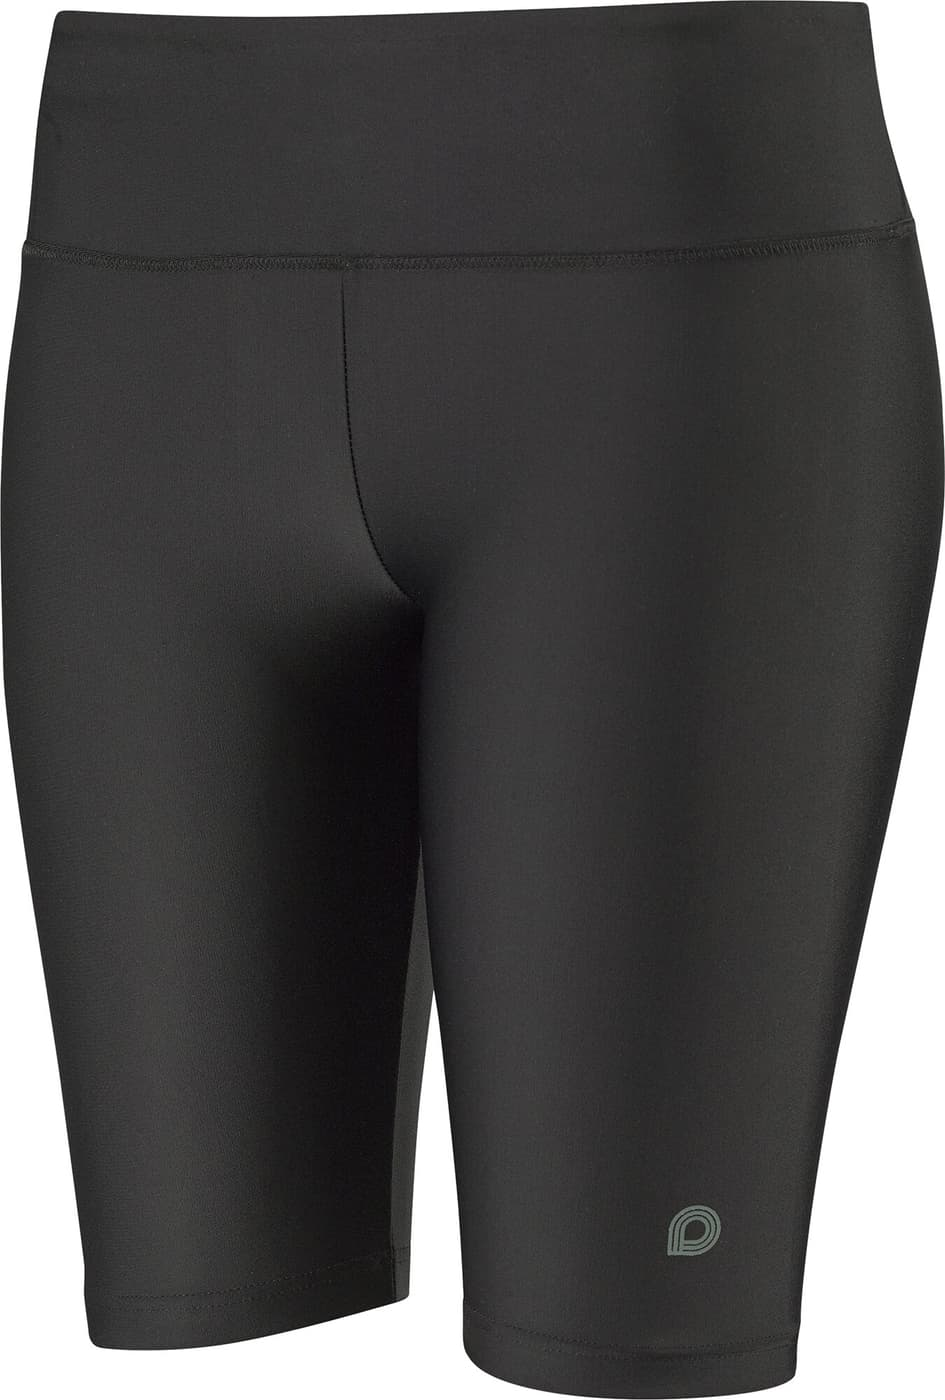 perform damen-radler-tights